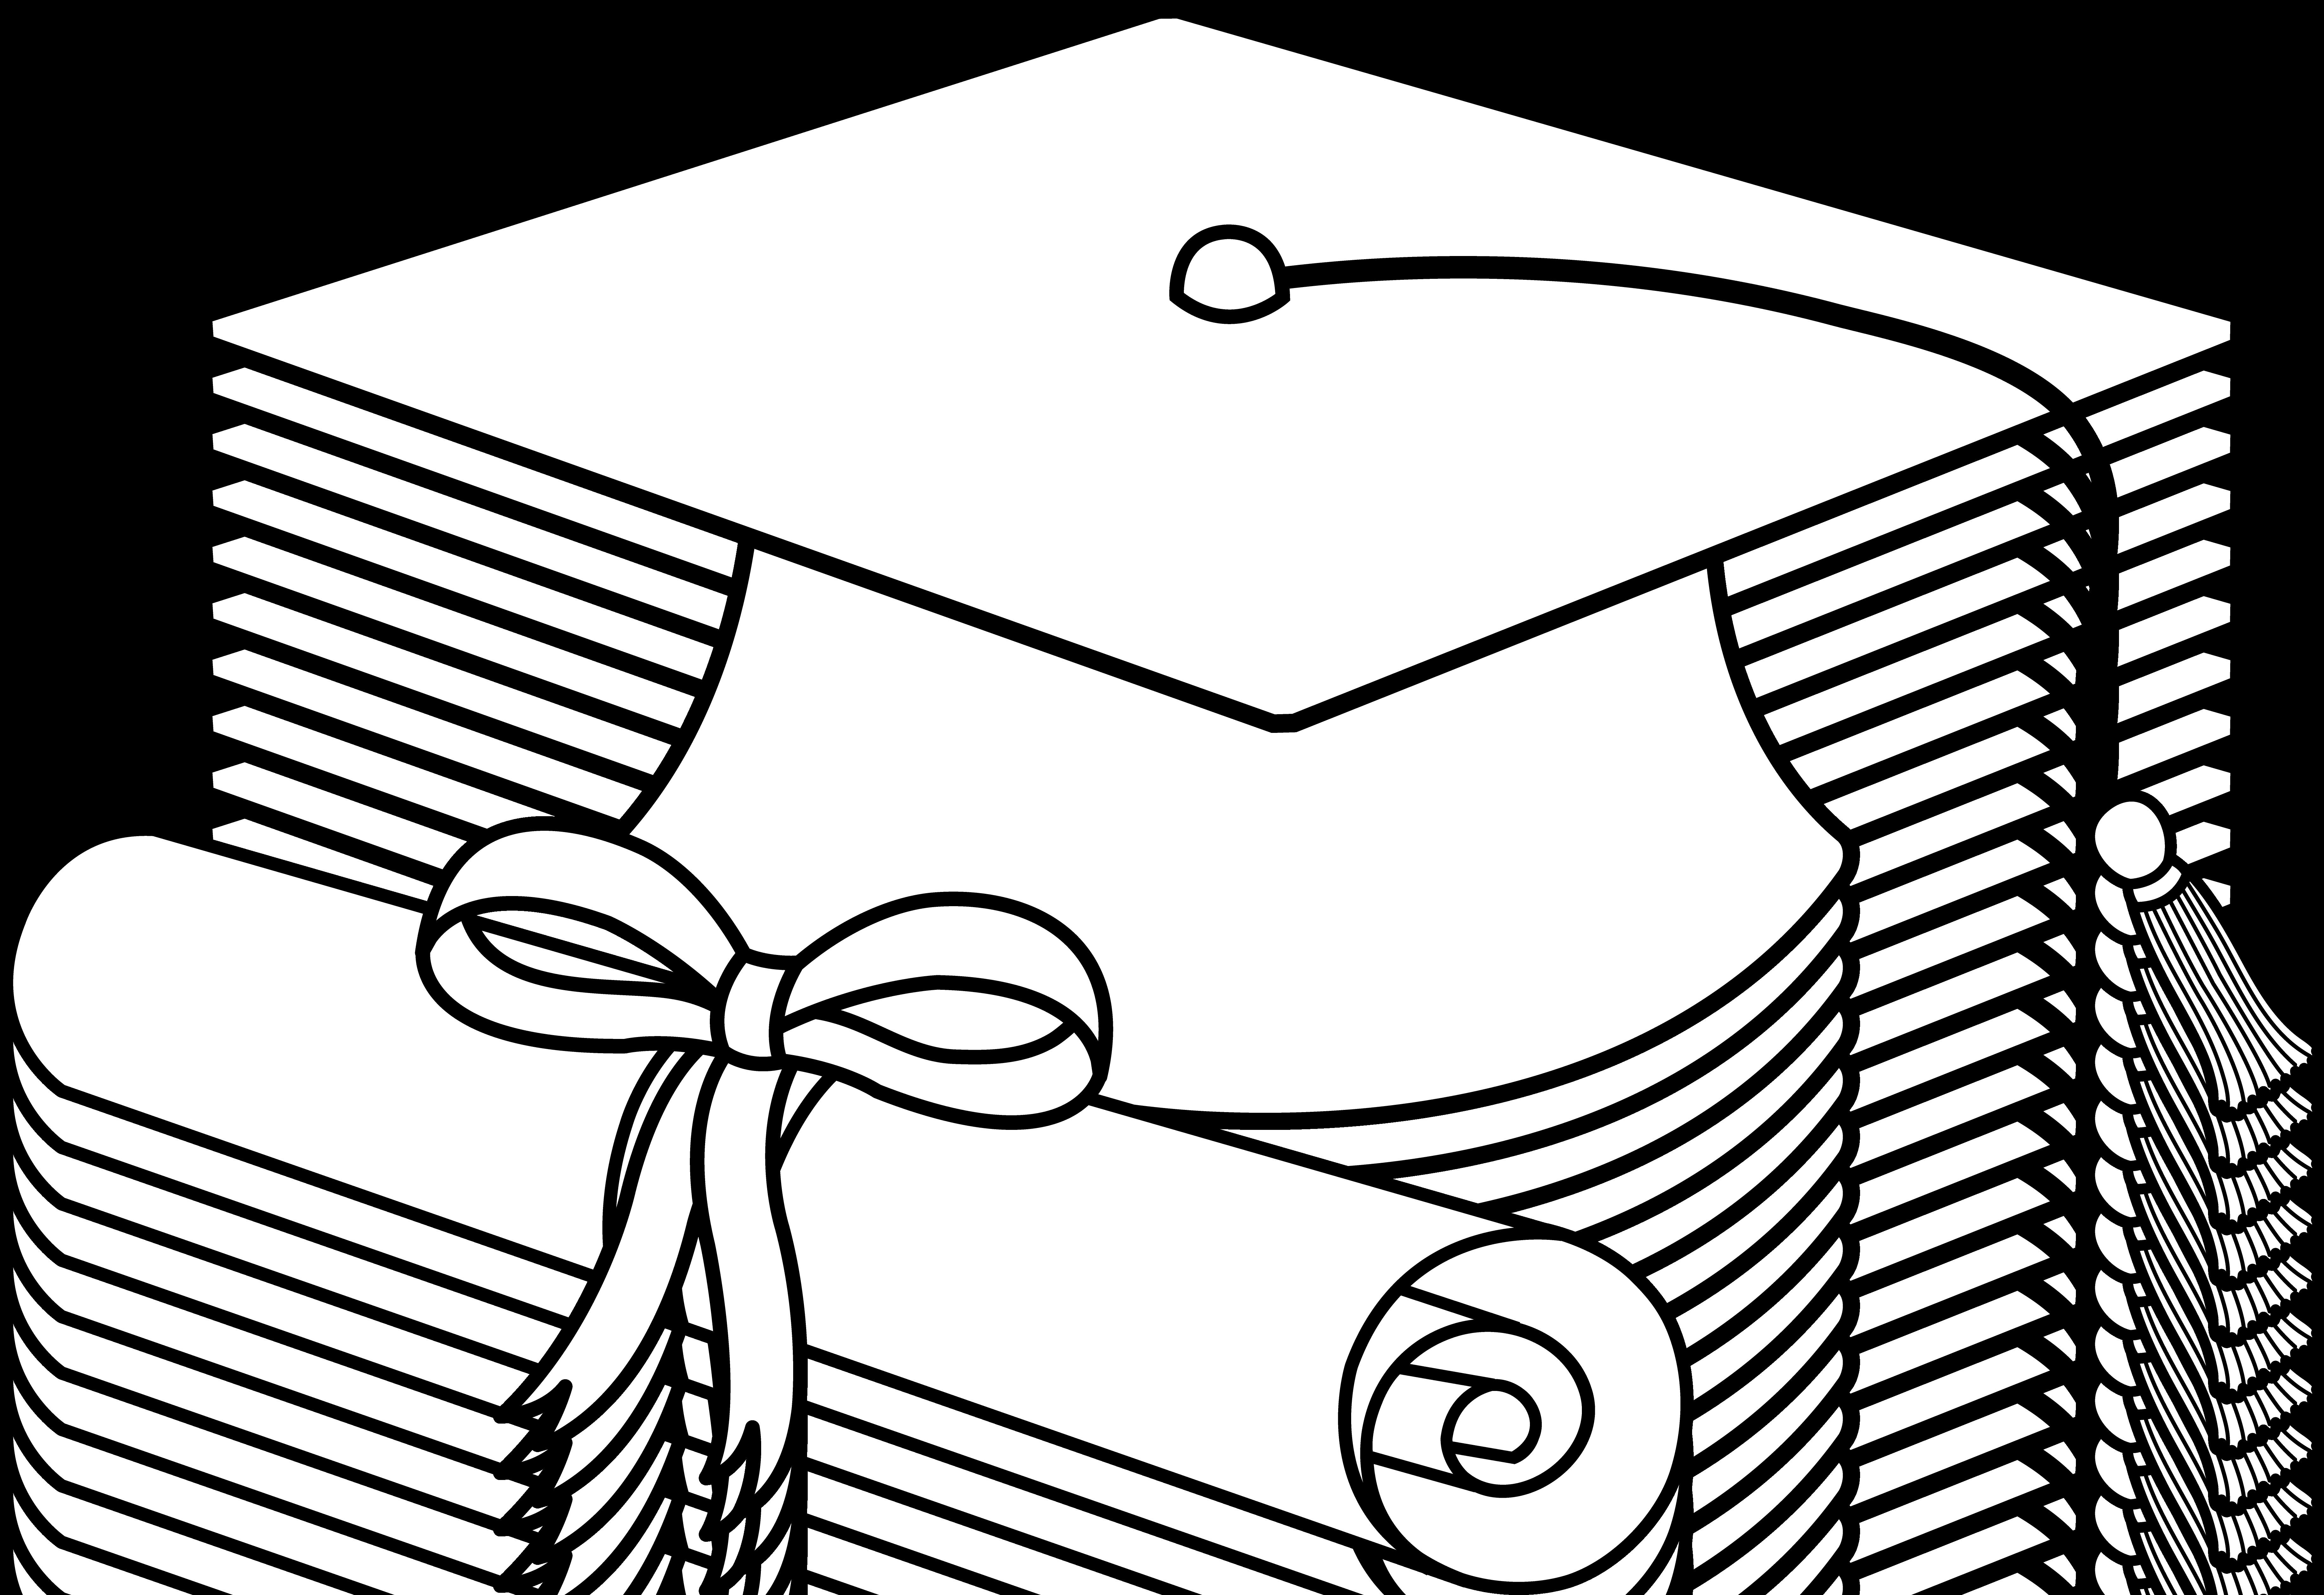 High school graduation clipart clip library download 28+ Collection of Graduating High School Clipart | High quality ... clip library download